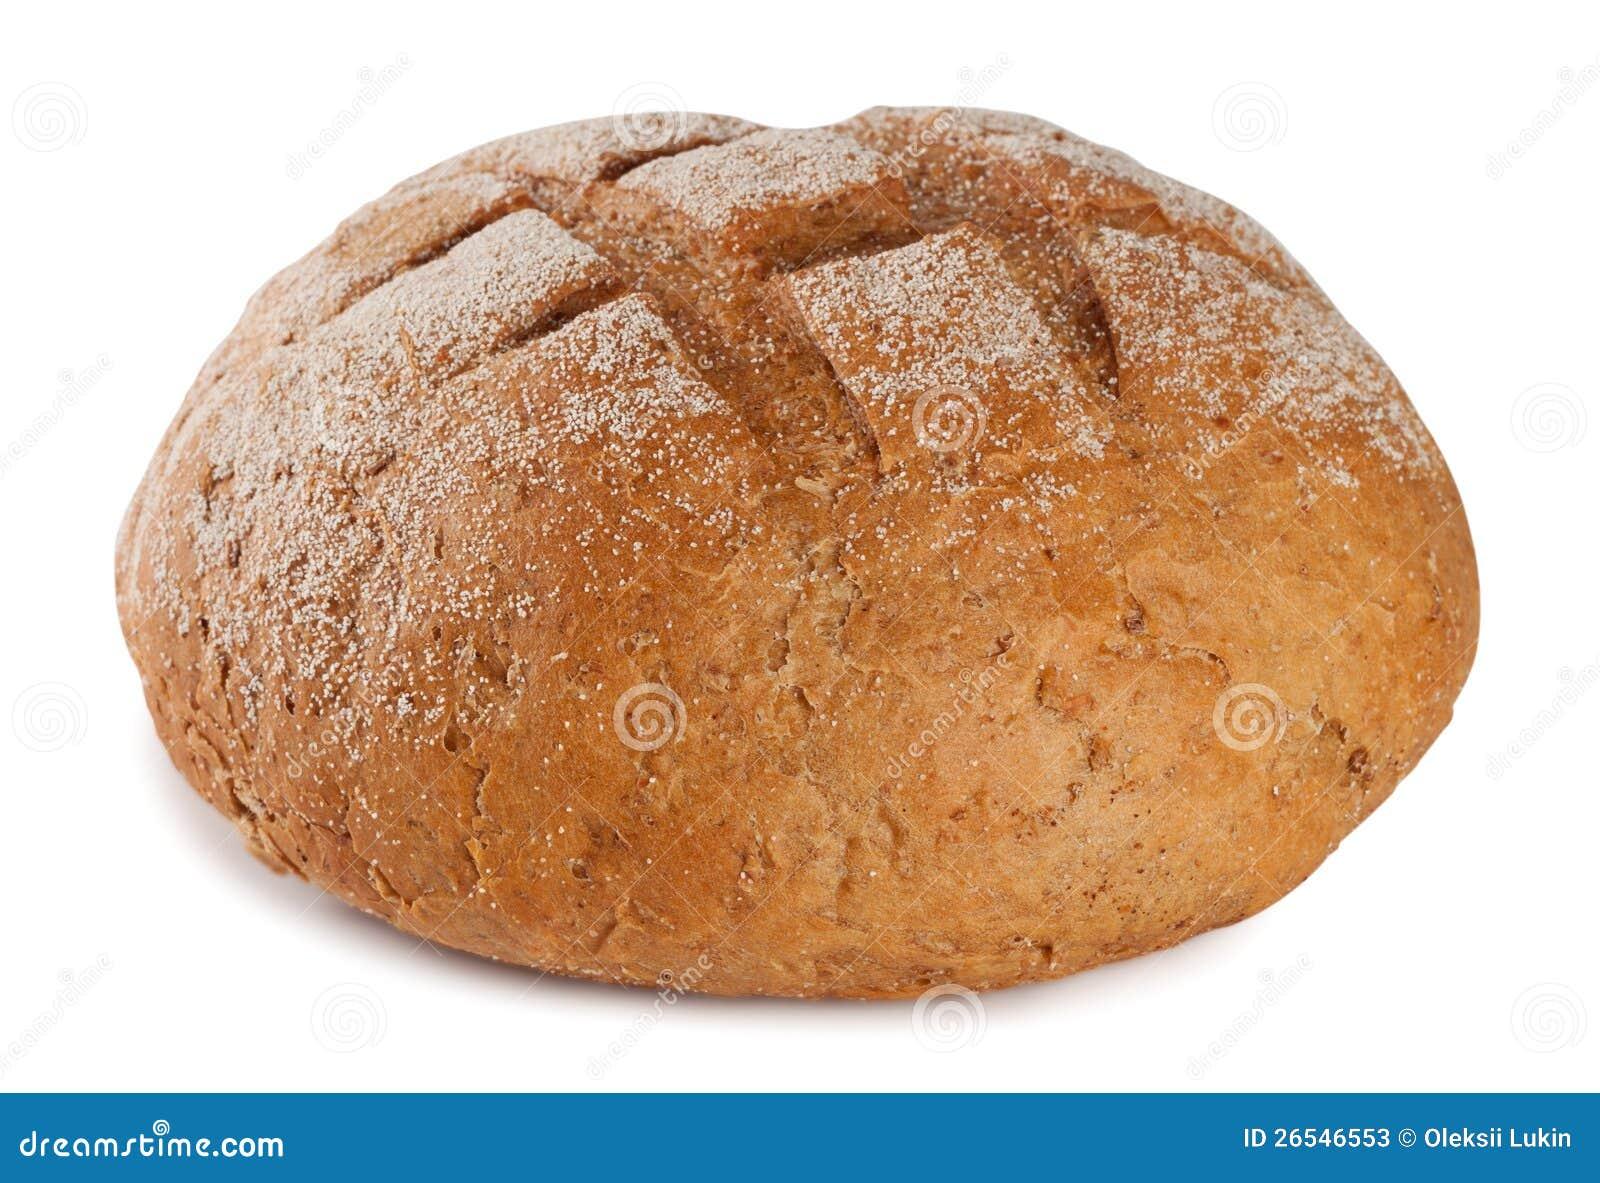 круглый хлеб фото